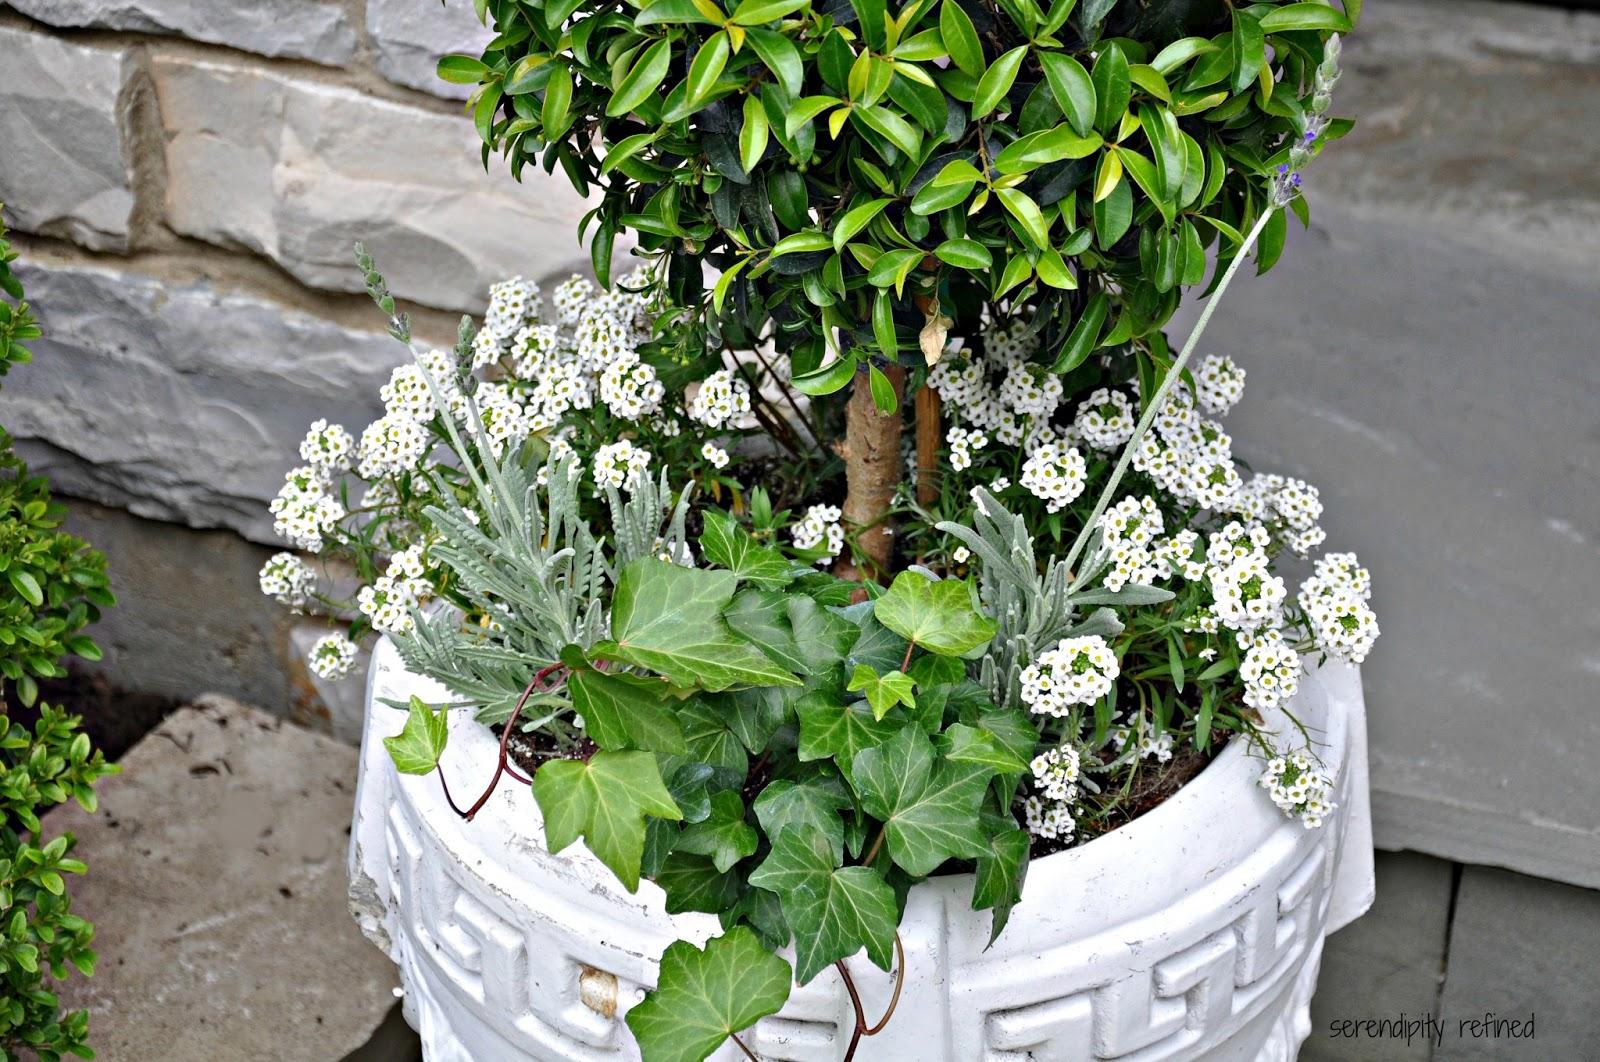 Serendipity refined blog summer urns and container gardens tips summer urn planter container garden hydrangea lavender rose ivy grey white green pink purple rubansaba